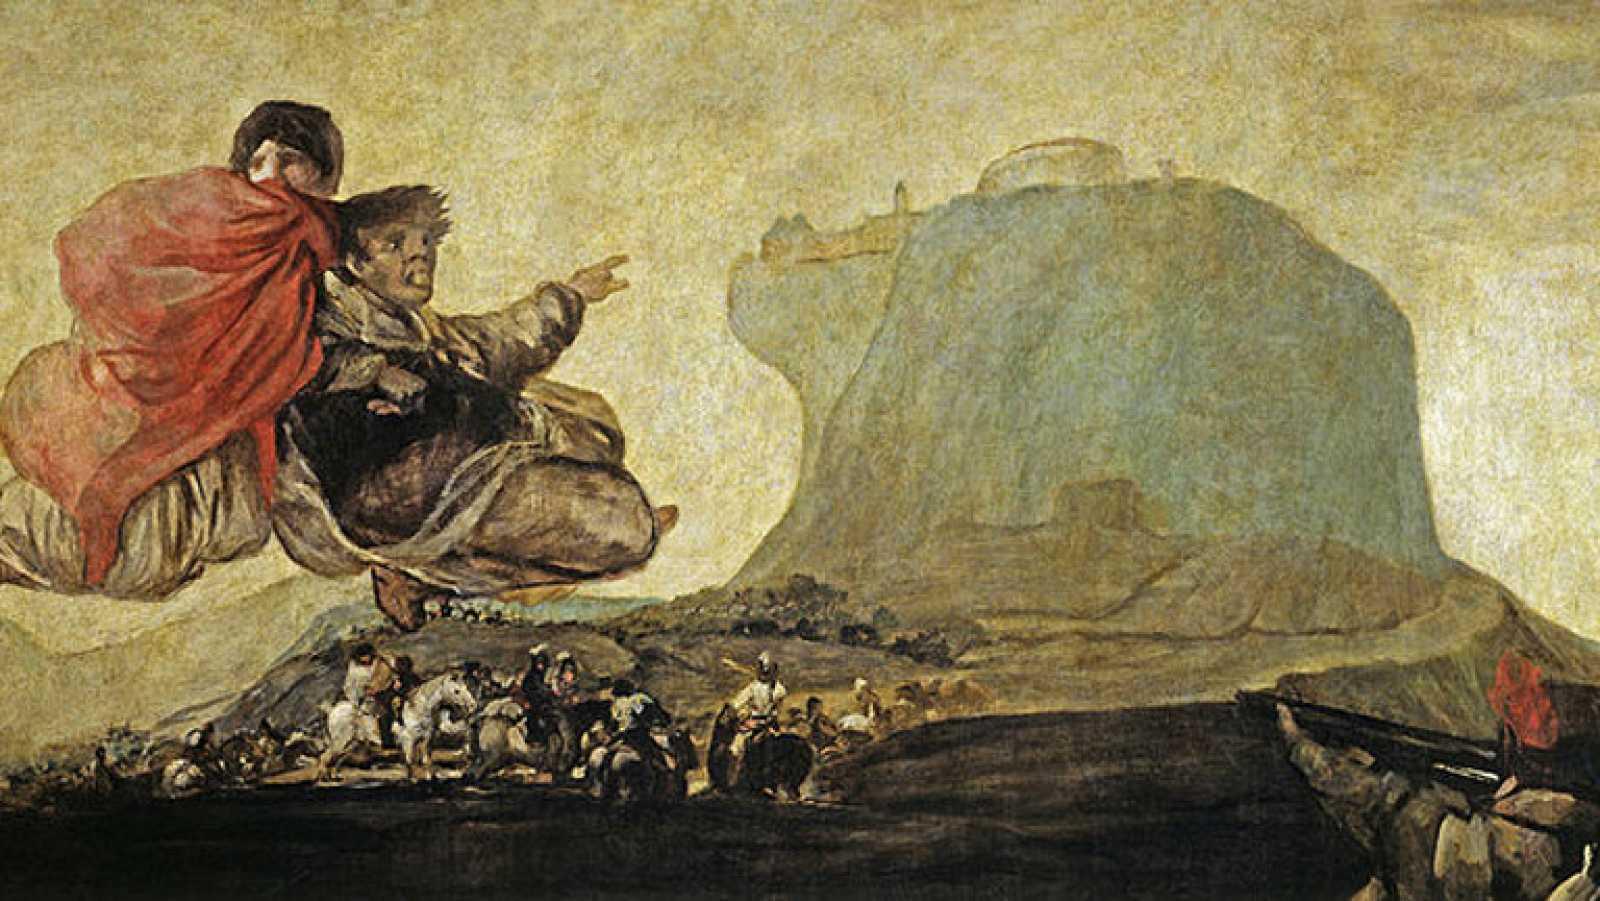 Mirar un cuadro - Visión fantástica (Goya)